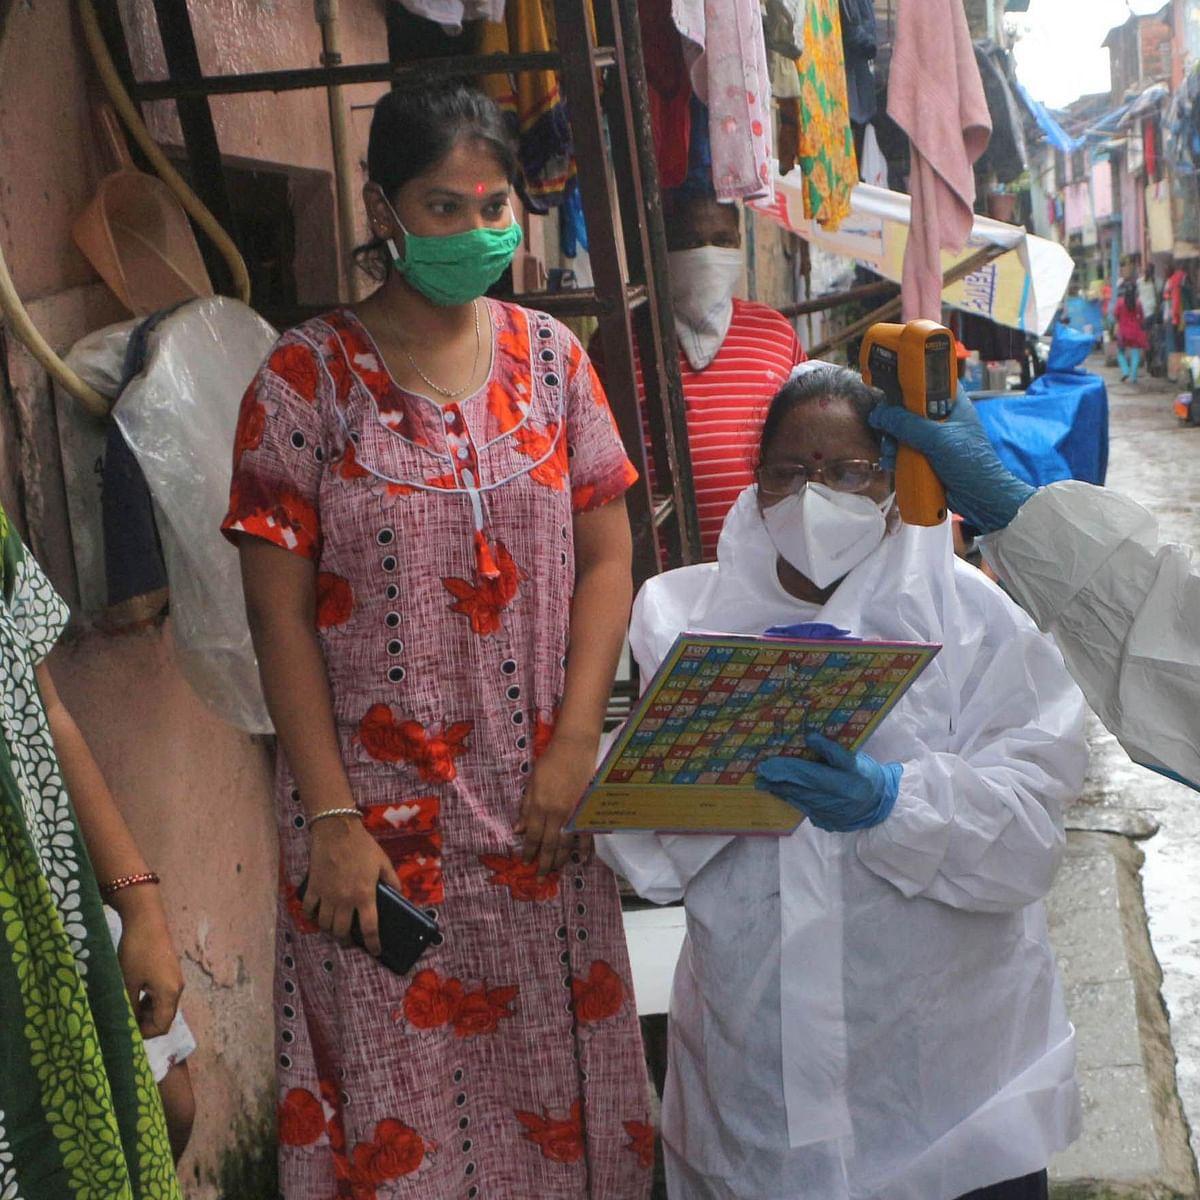 Coronavirus in Mumbai: BMC to increase testing capacity by 1,200 tests per day, to set up three RT-PCR labs